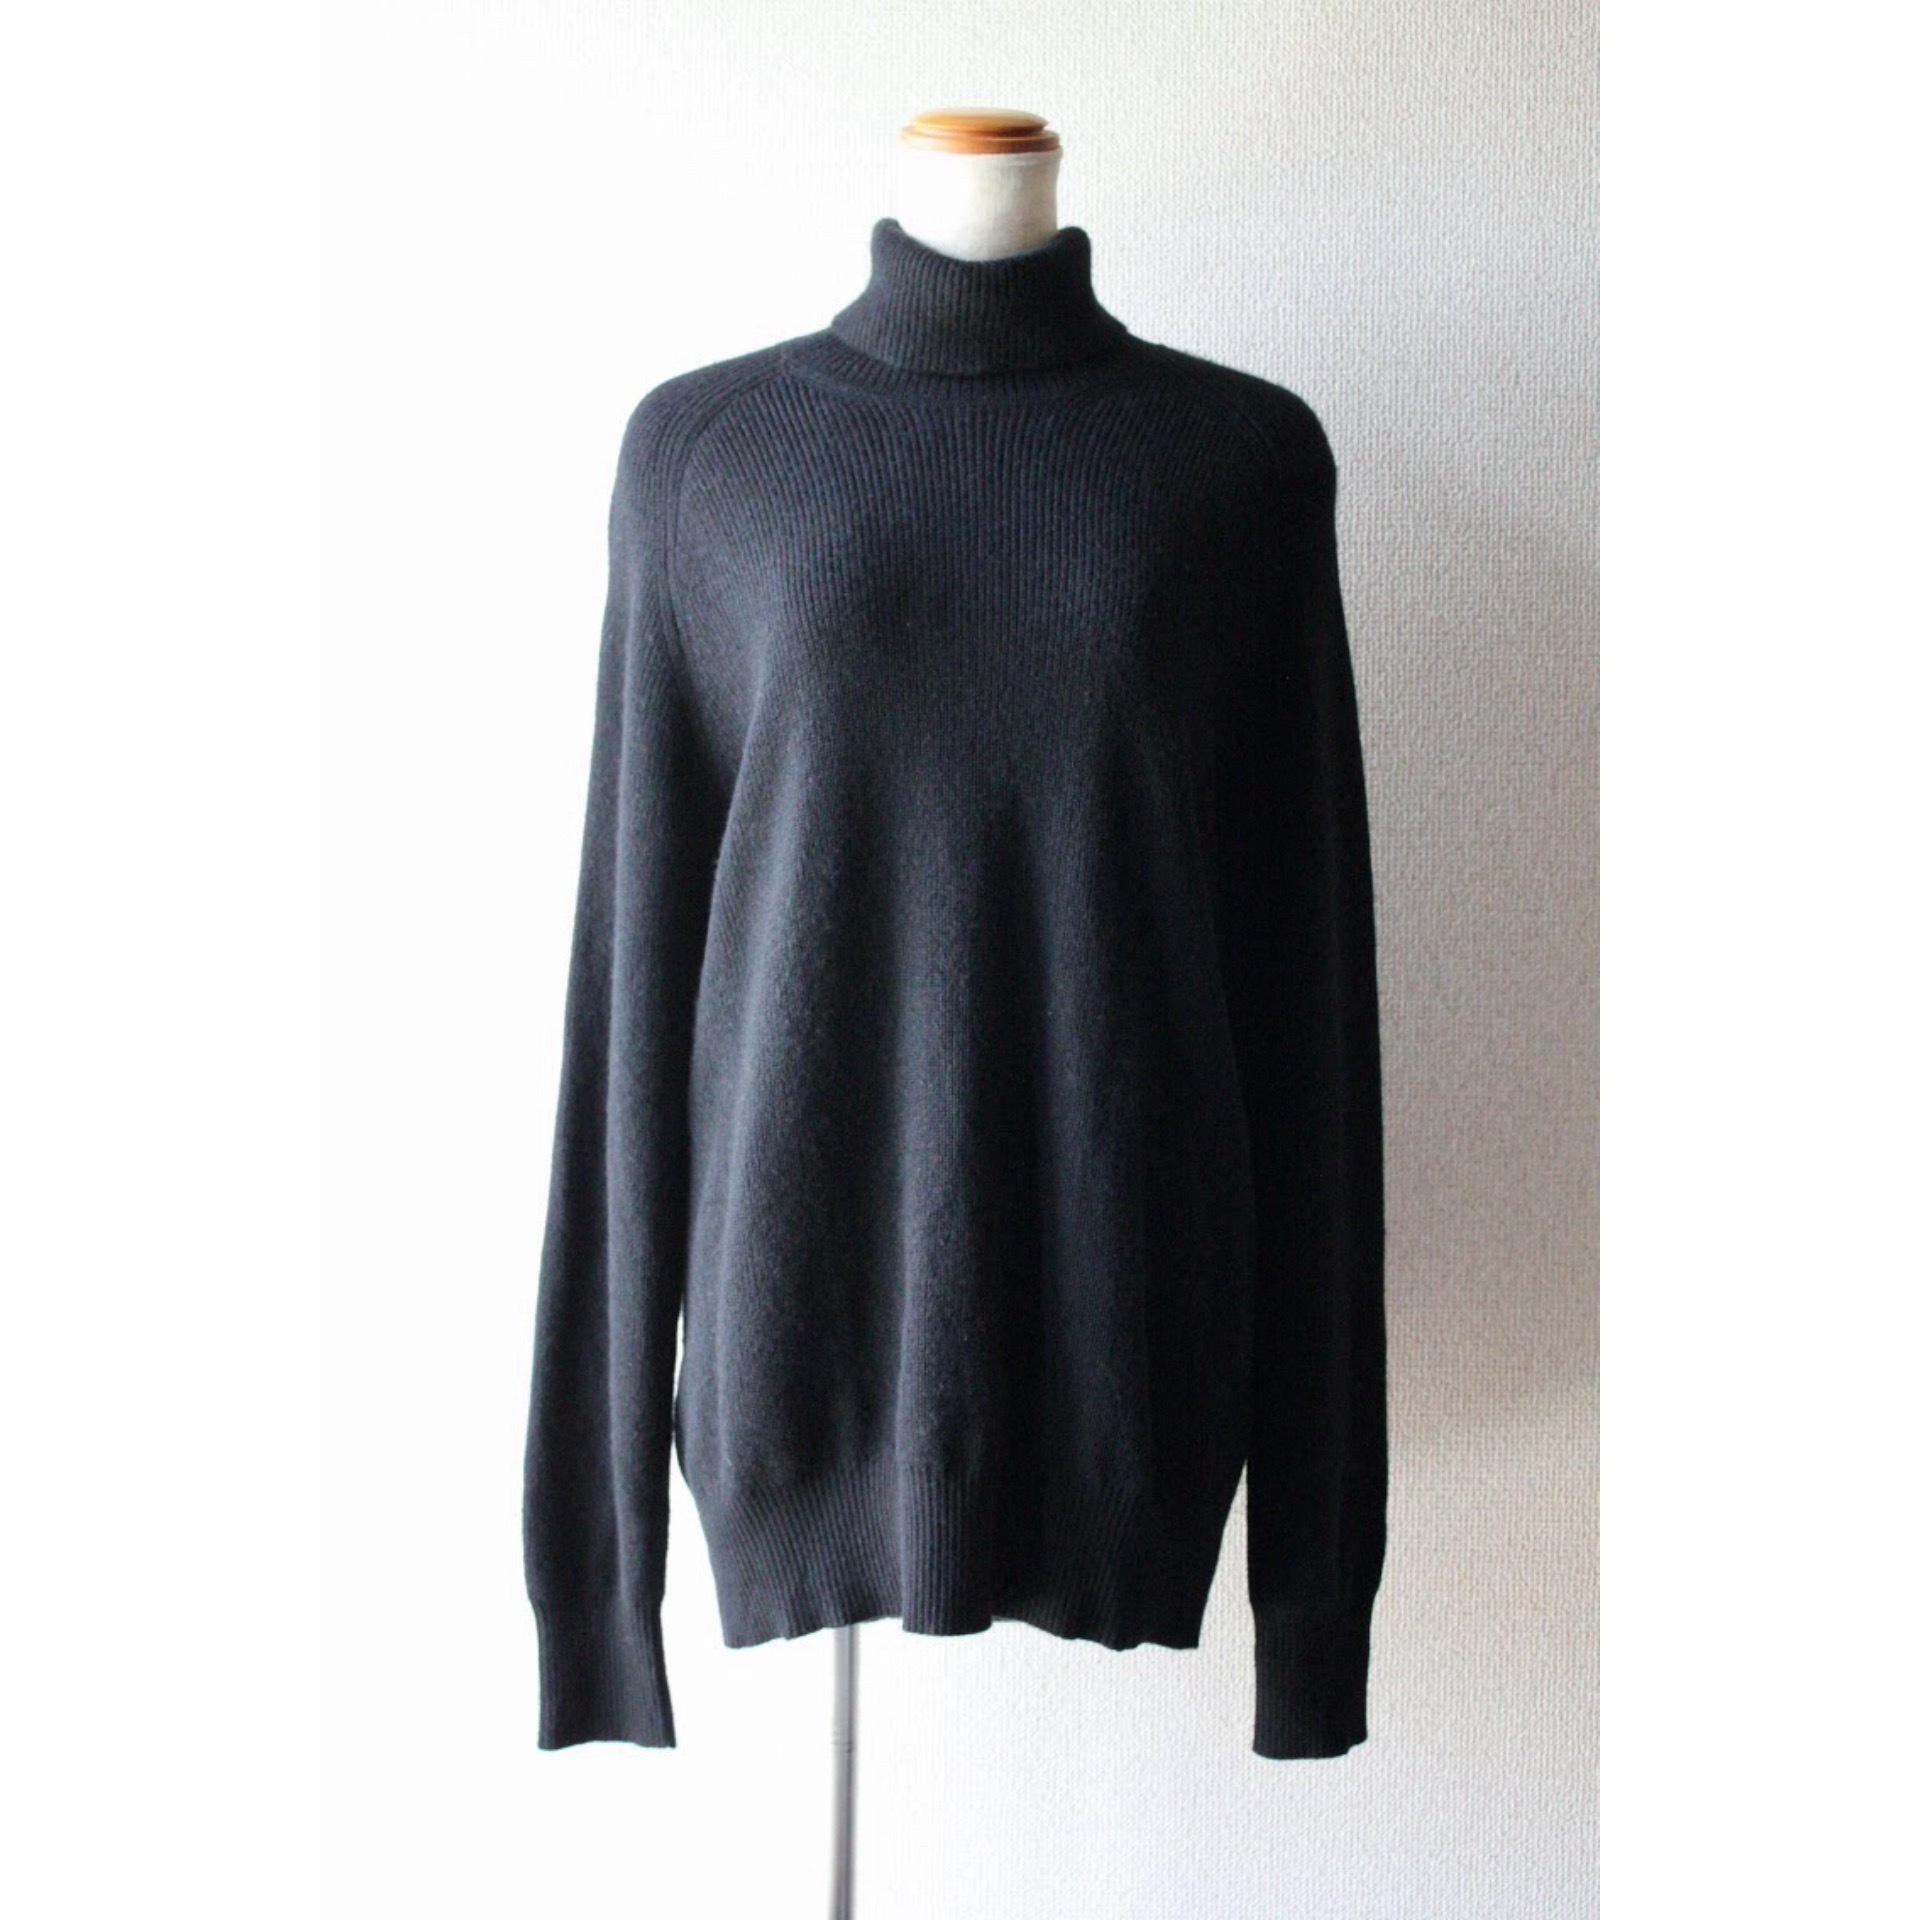 Vintage turtle neck cashmere sweater